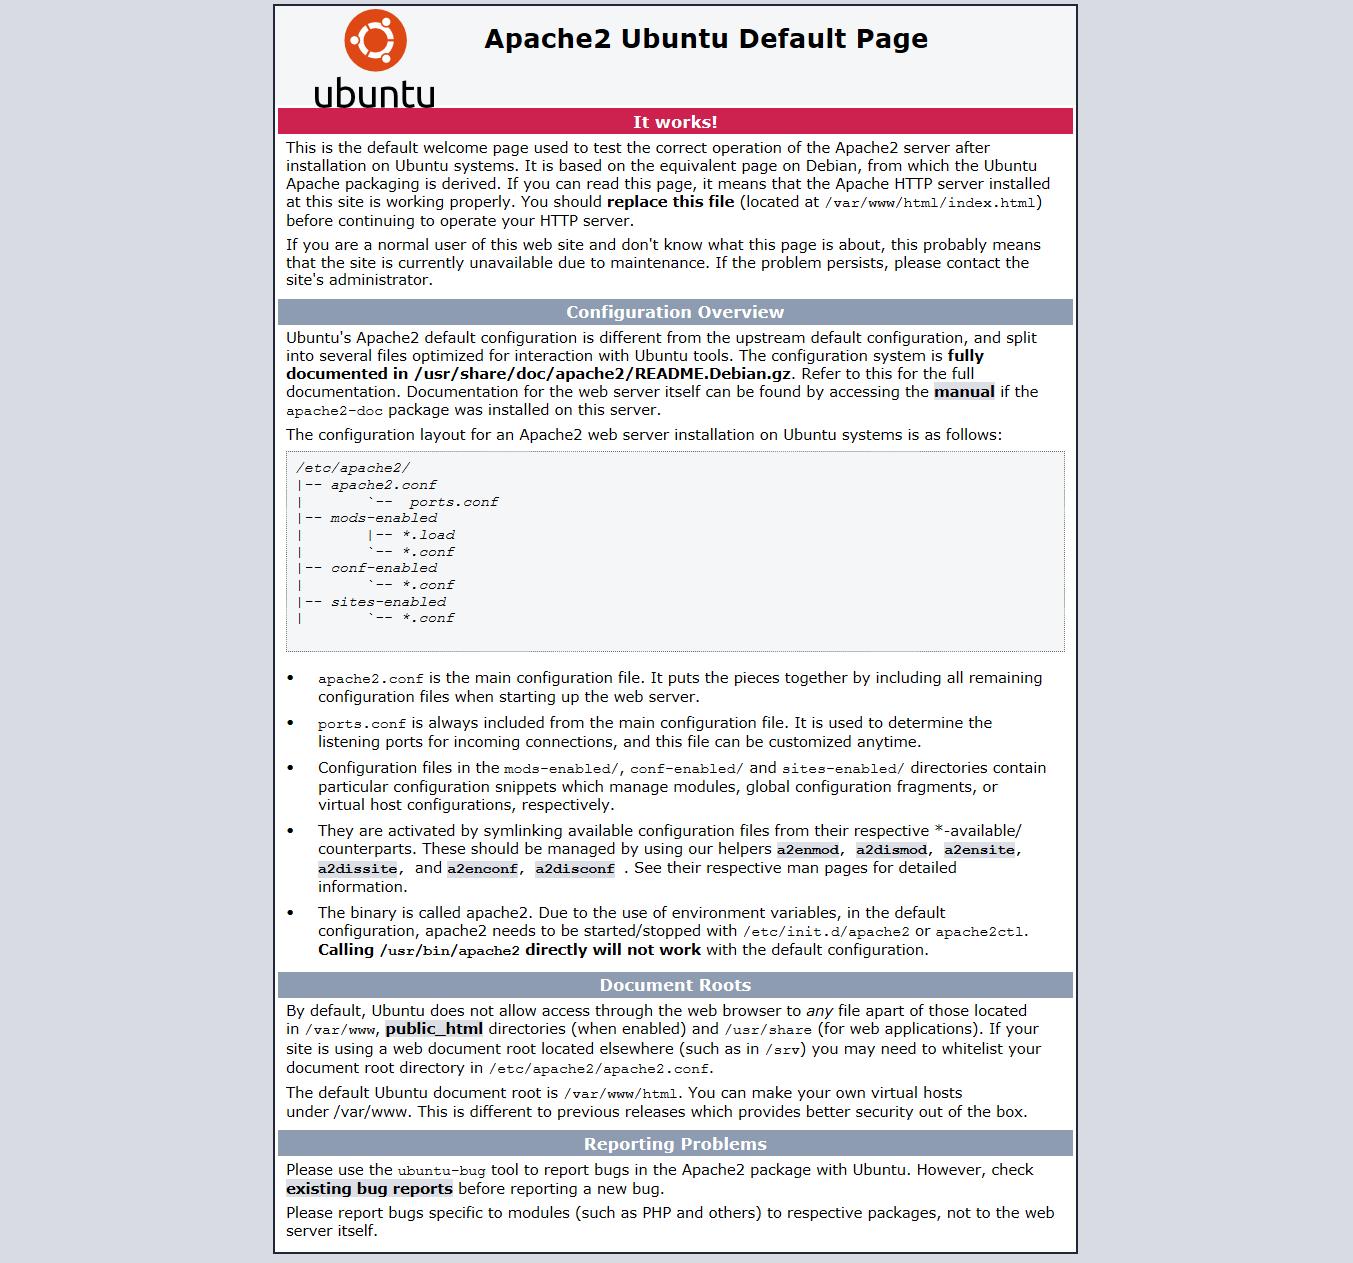 Apache2 Ubuntu Default Page_ It works.png